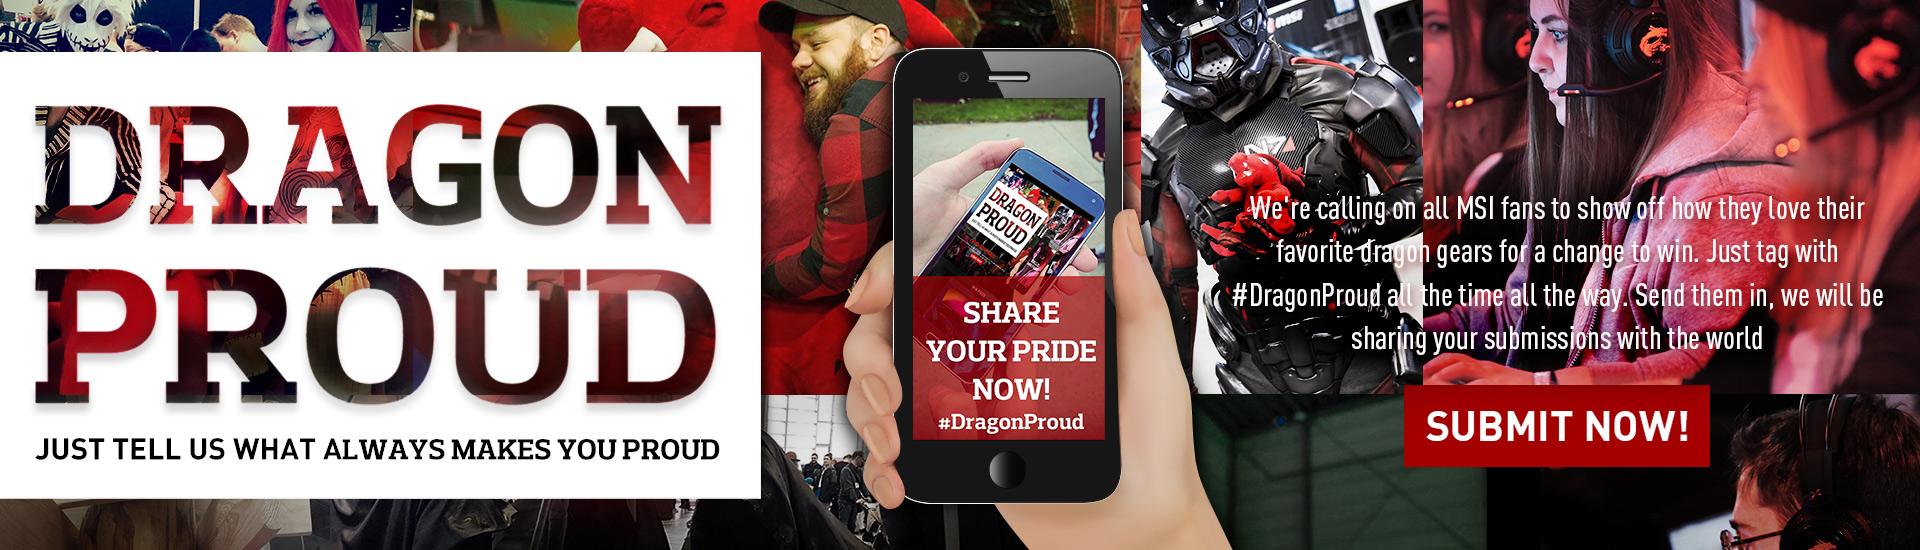 Dragon Proud